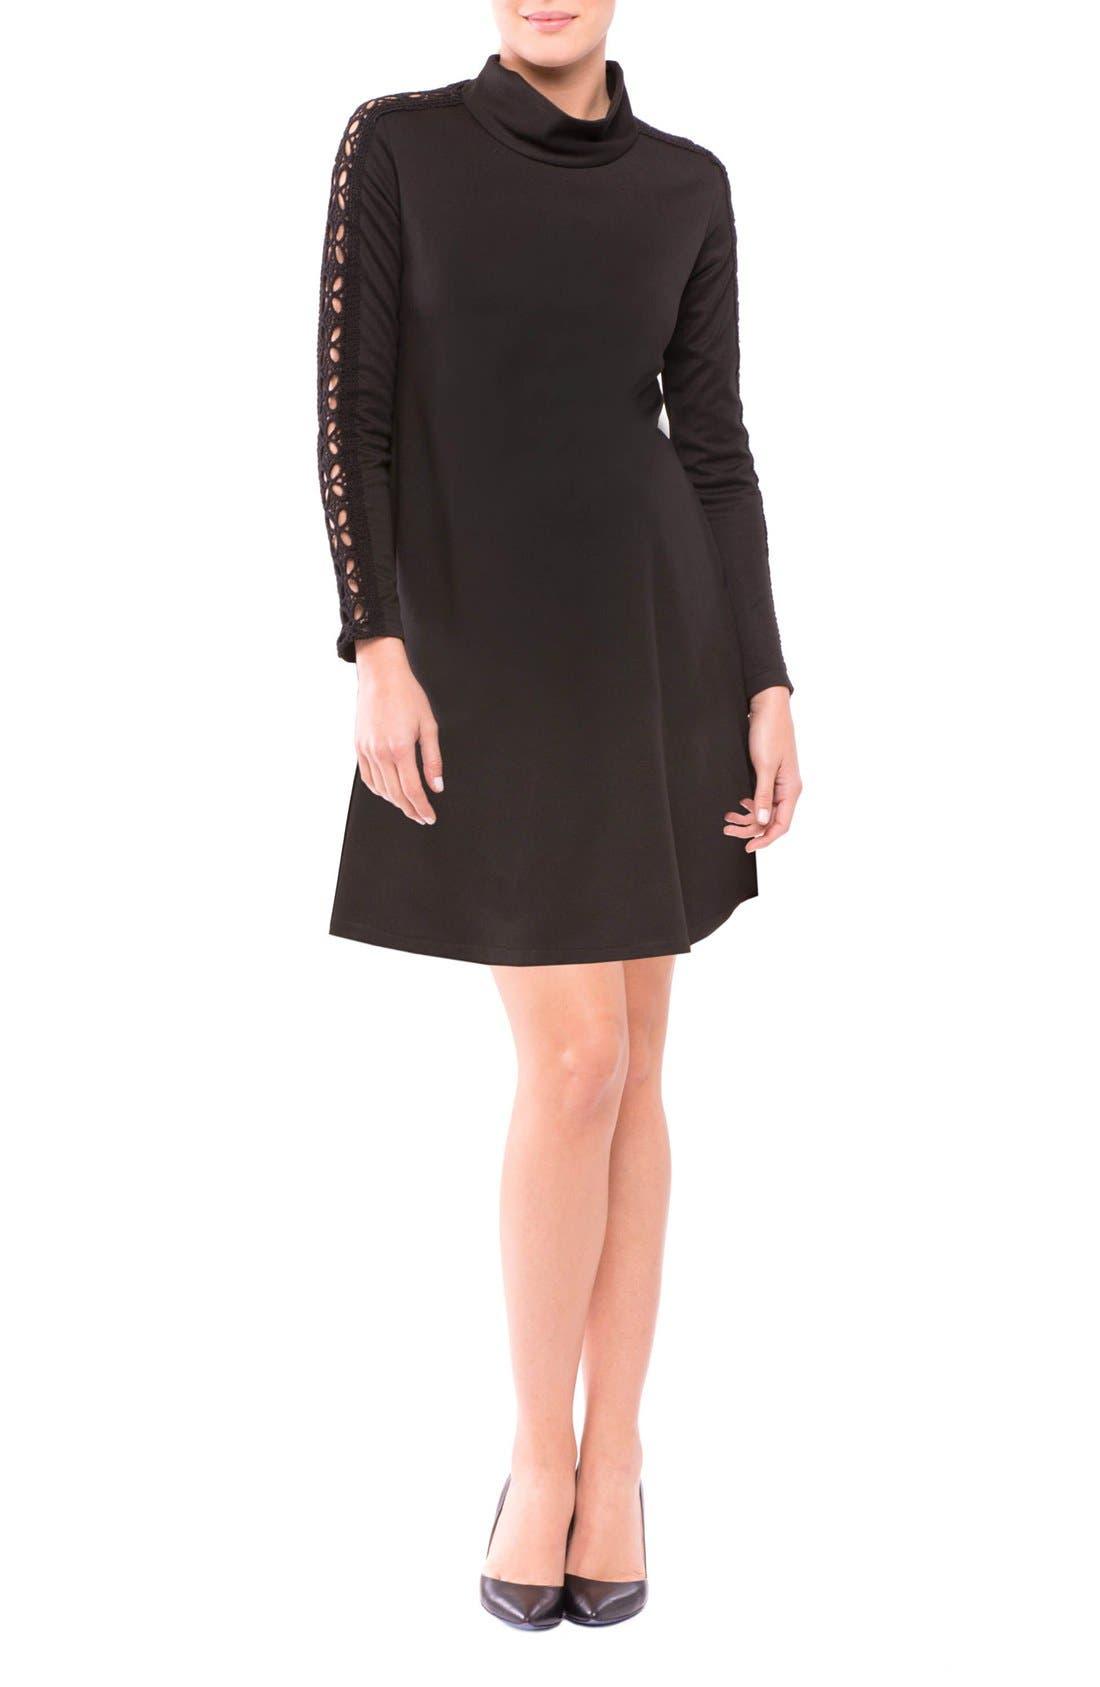 Olian Caroline Maternity Dress